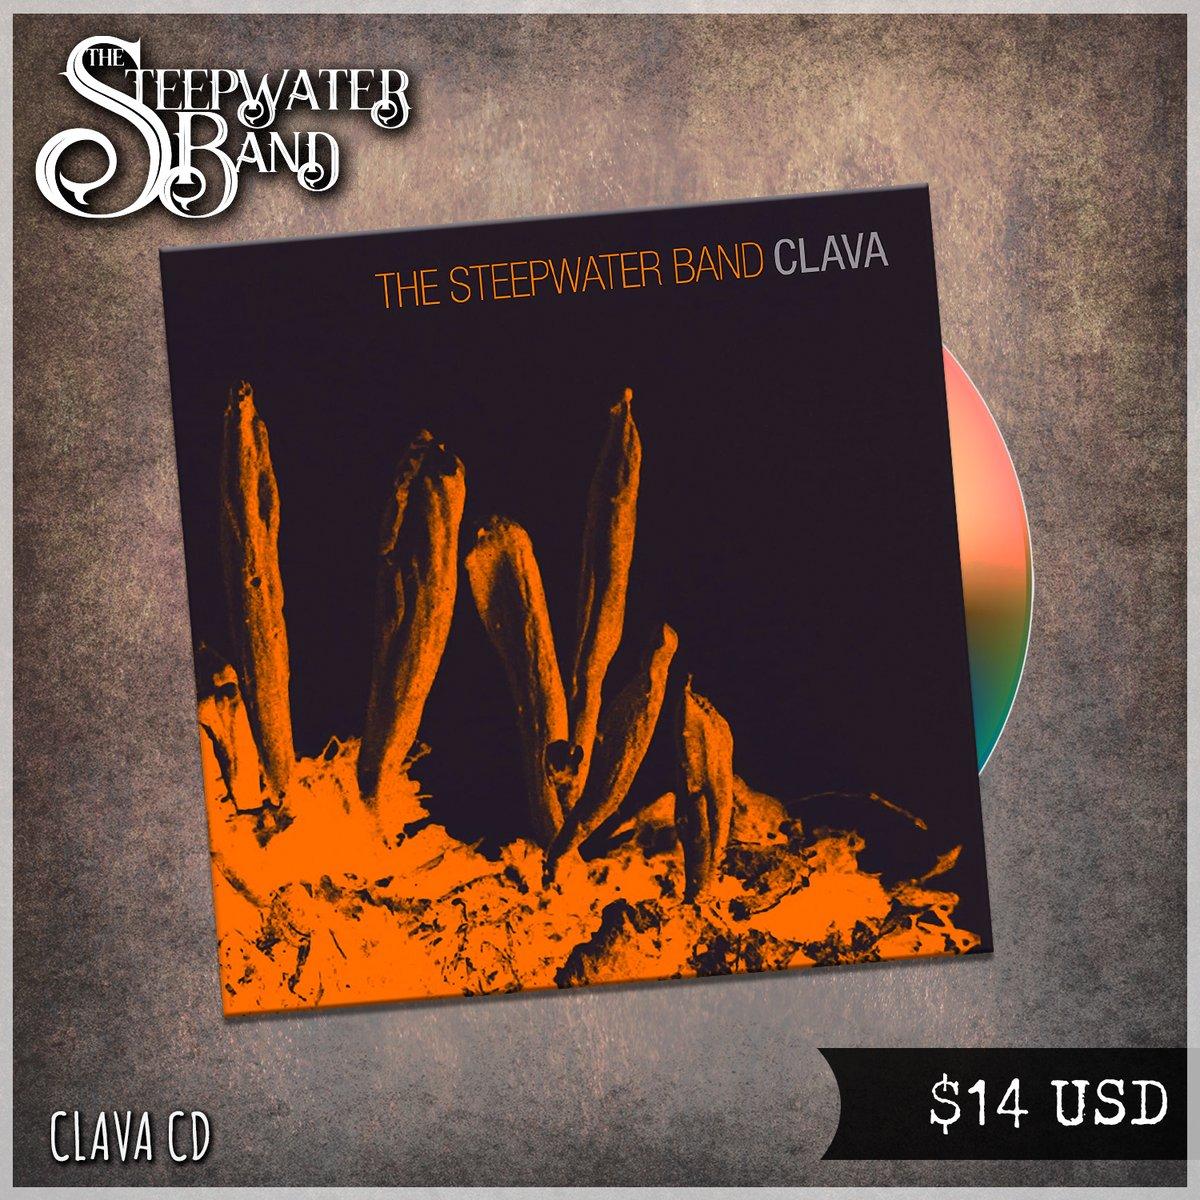 Clava CD